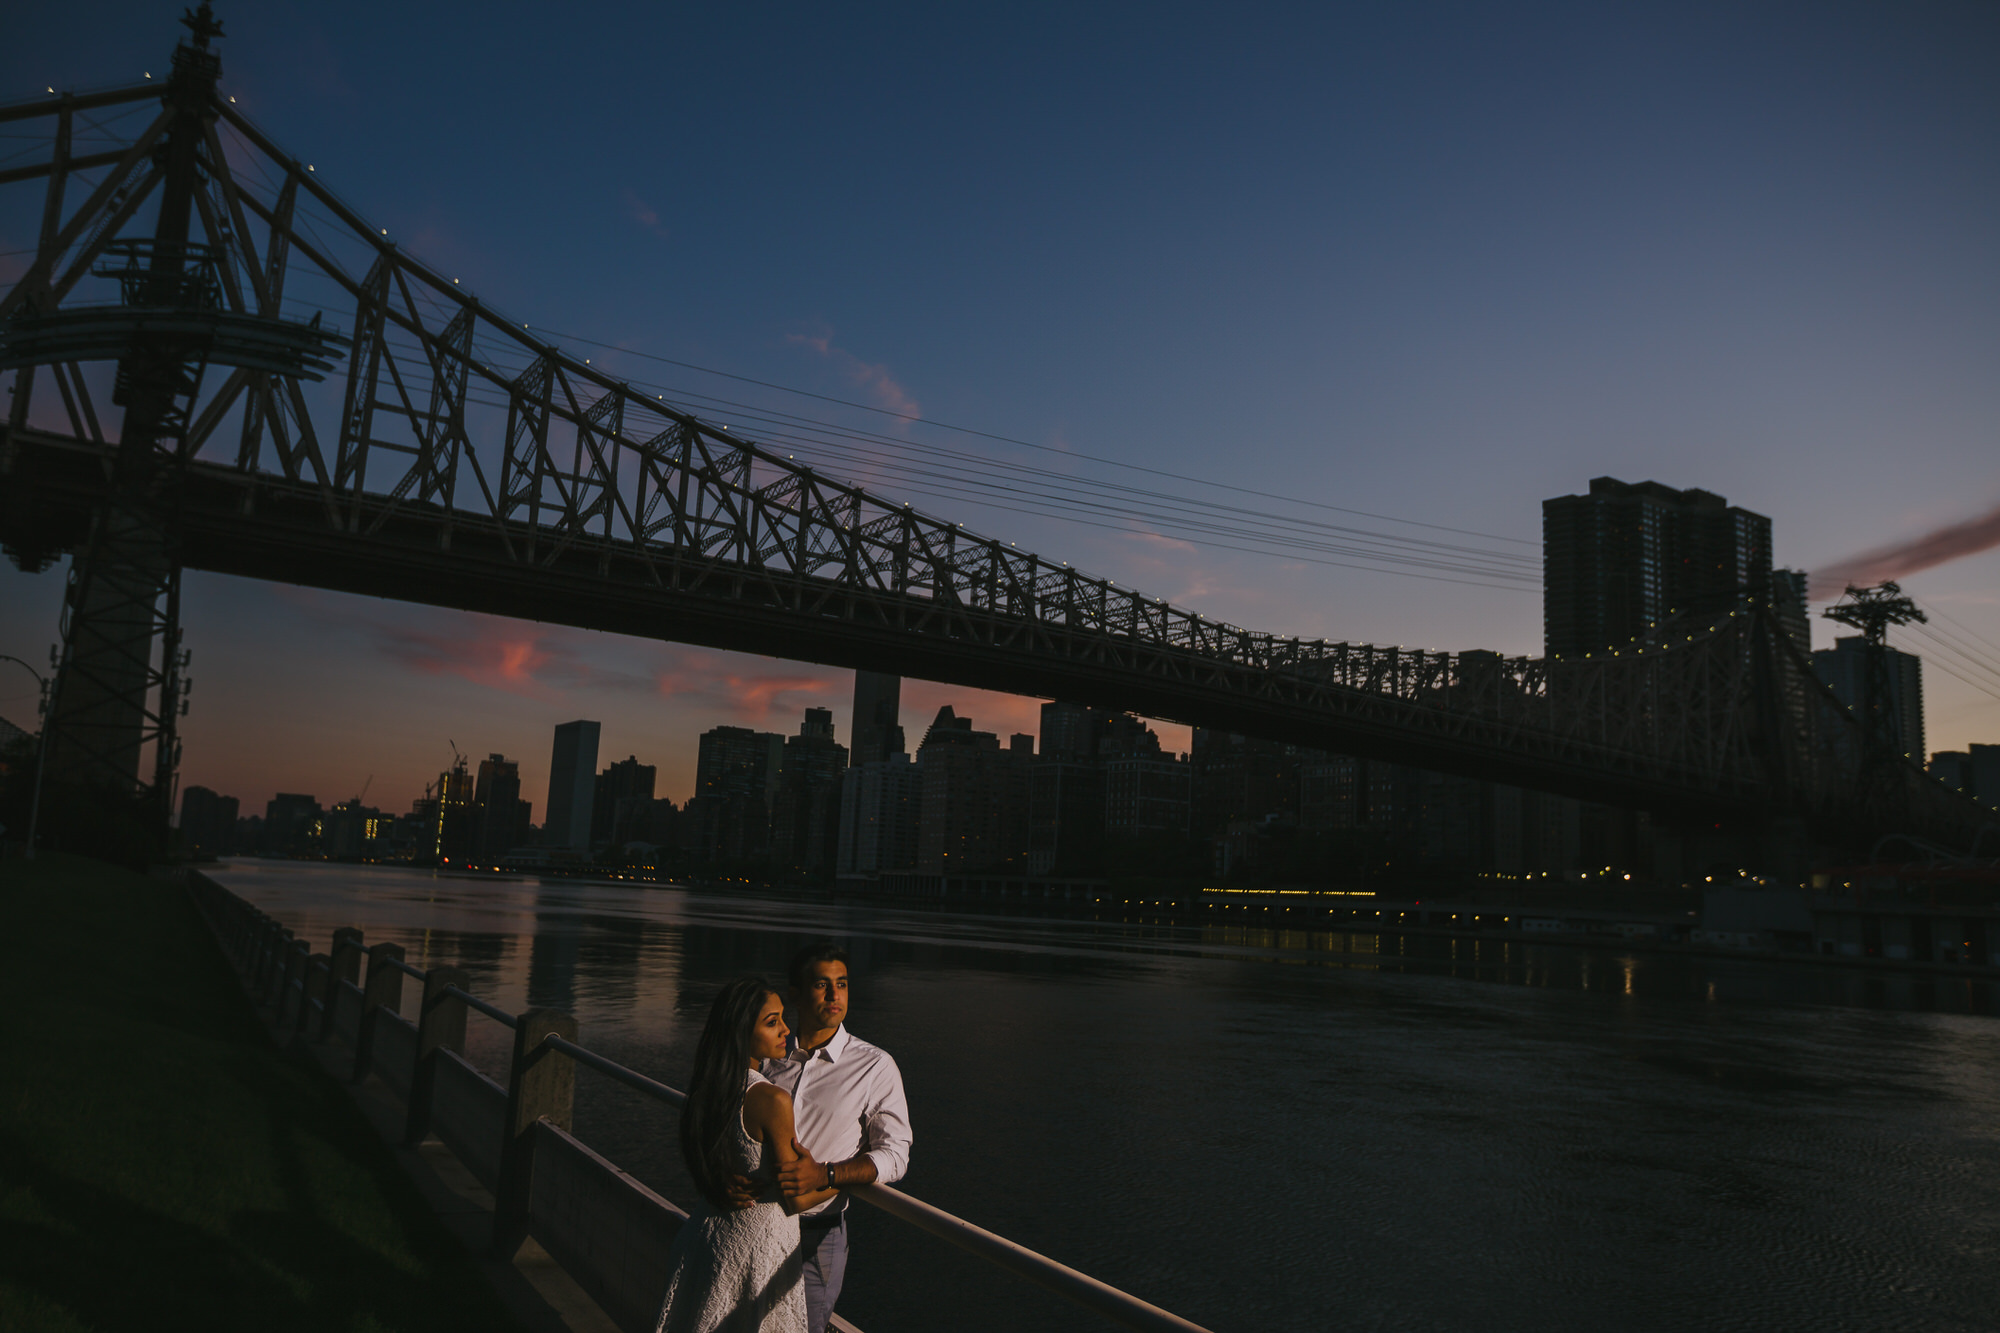 Kinisha-Neil-Eng-NYC-201-1.jpg